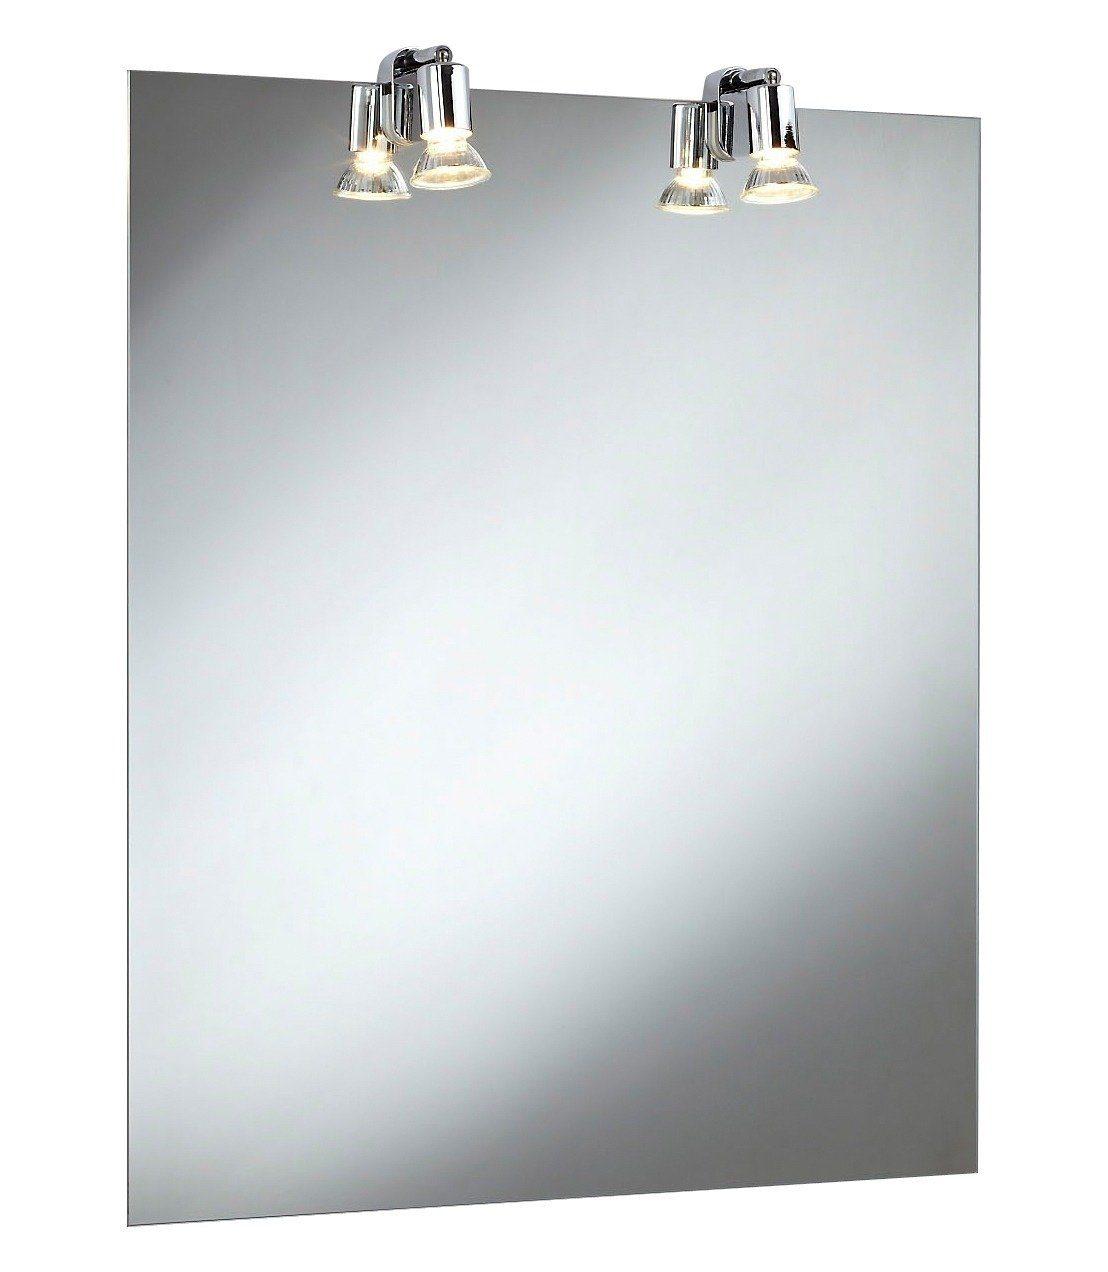 wc spiegel mit beleuchtung wo49 hitoiro. Black Bedroom Furniture Sets. Home Design Ideas